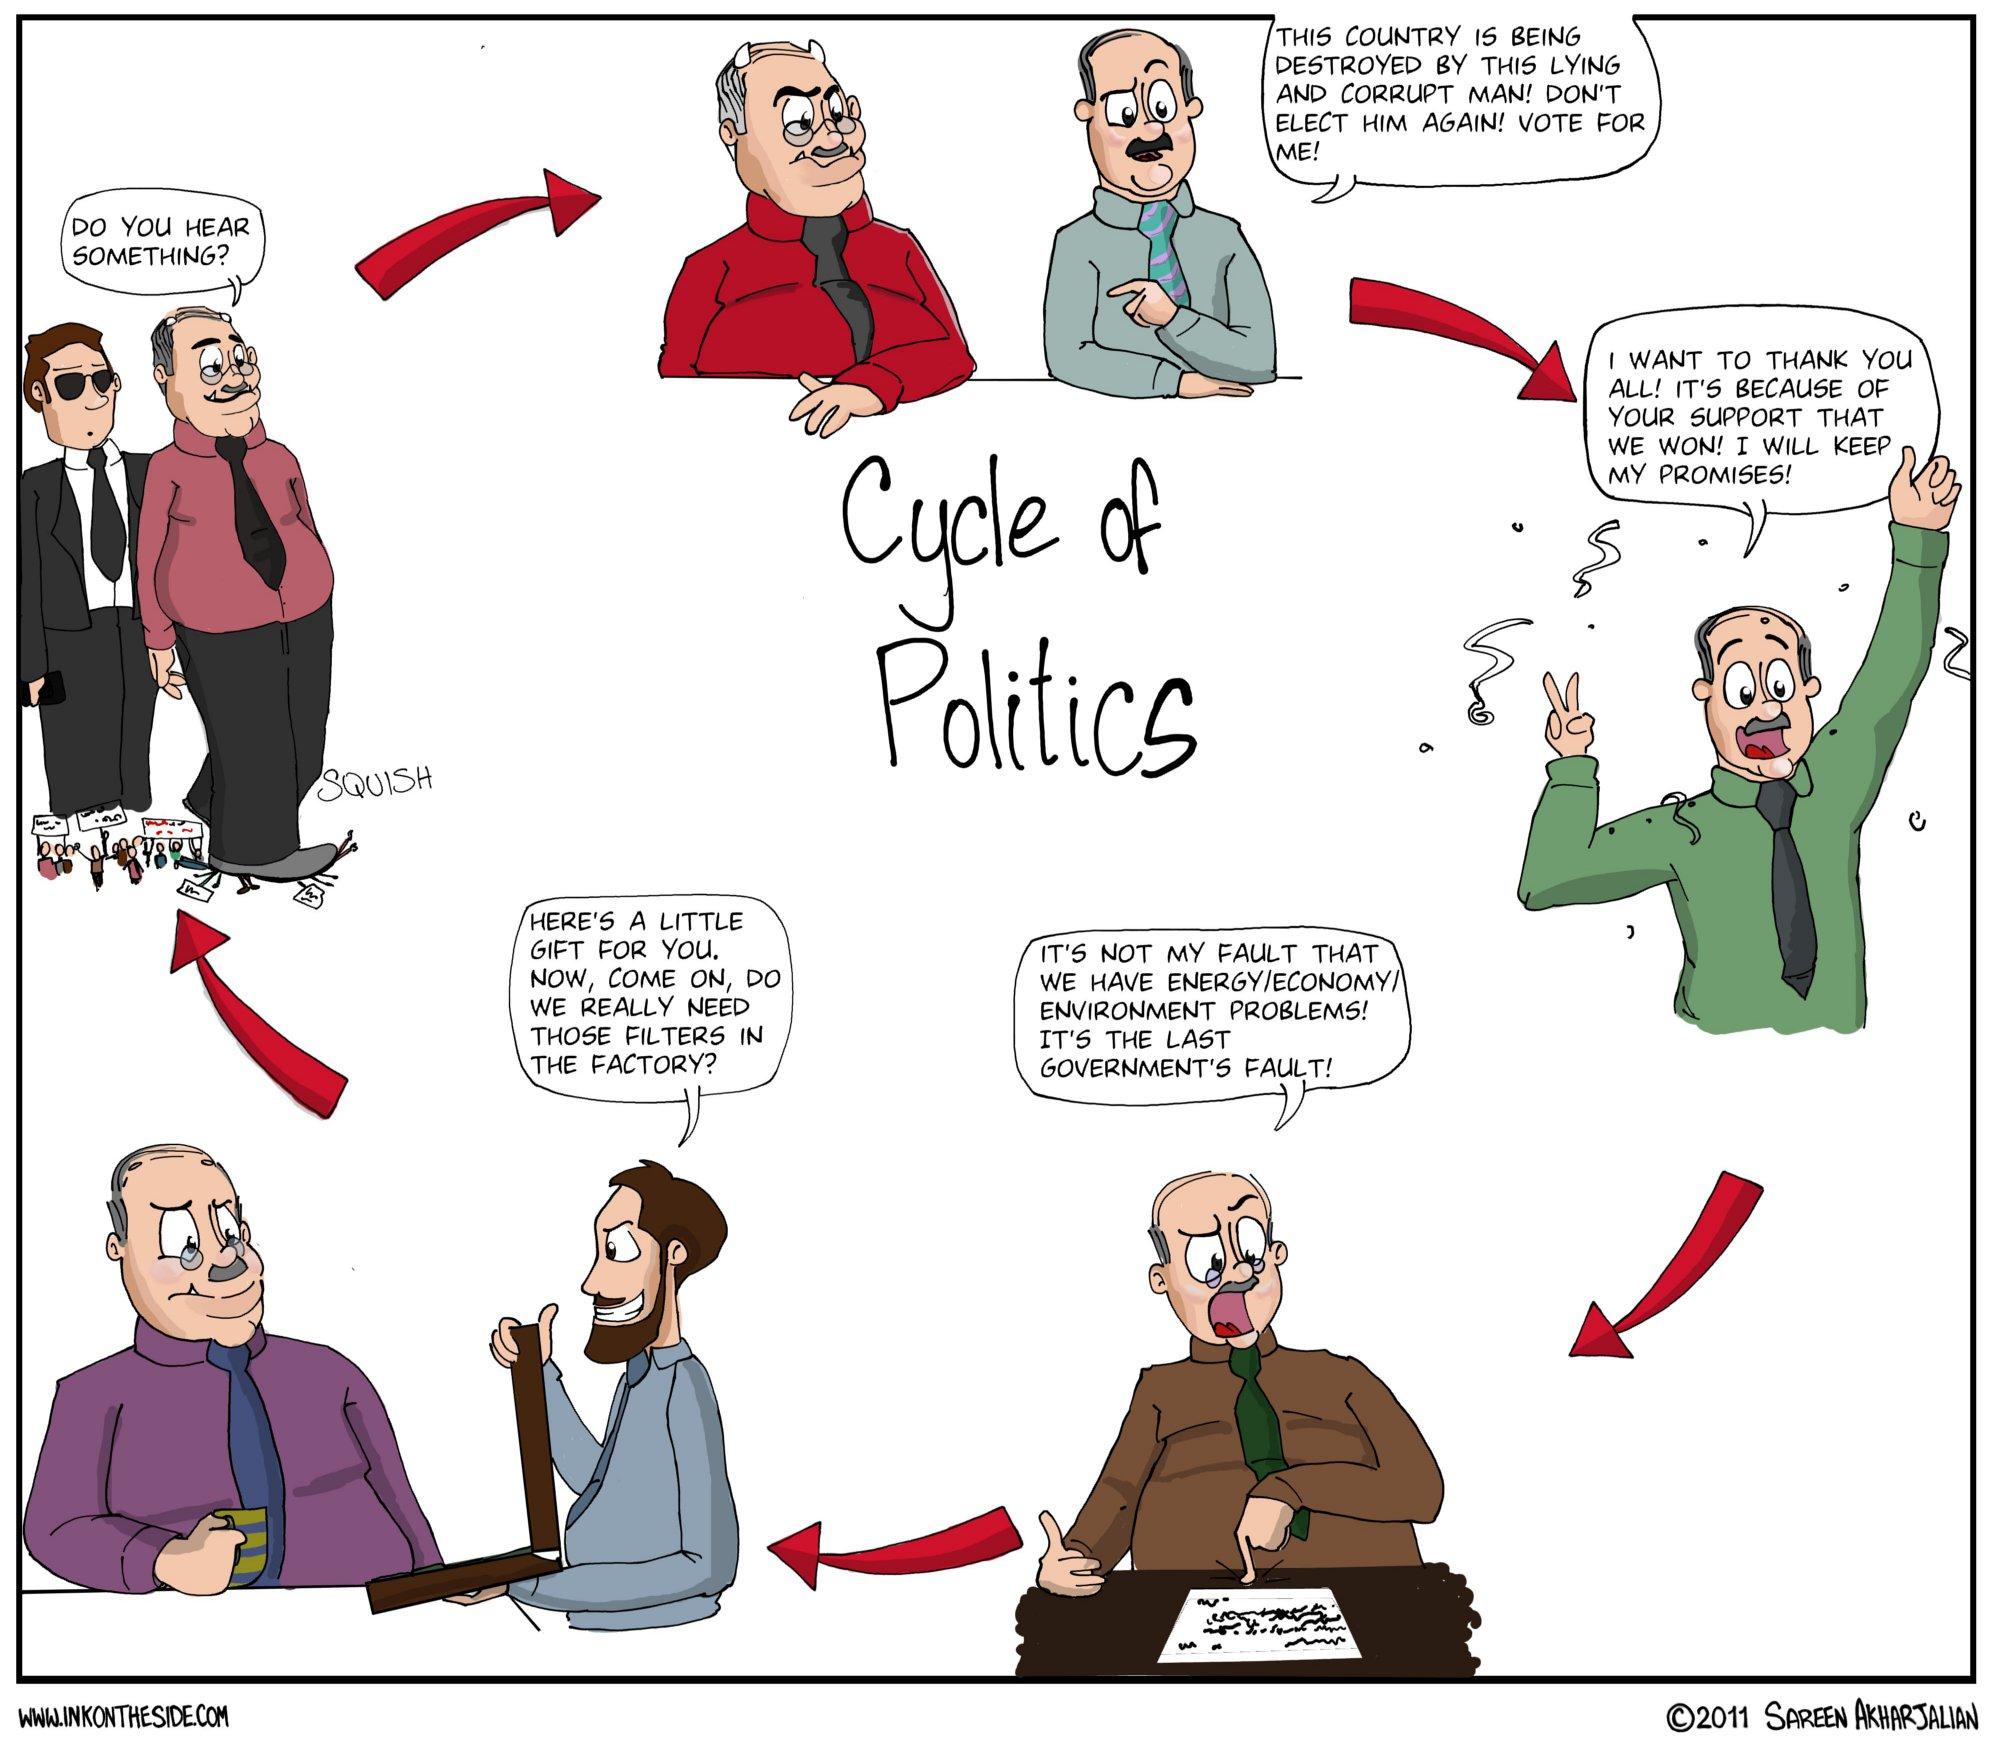 A Summary of Politics